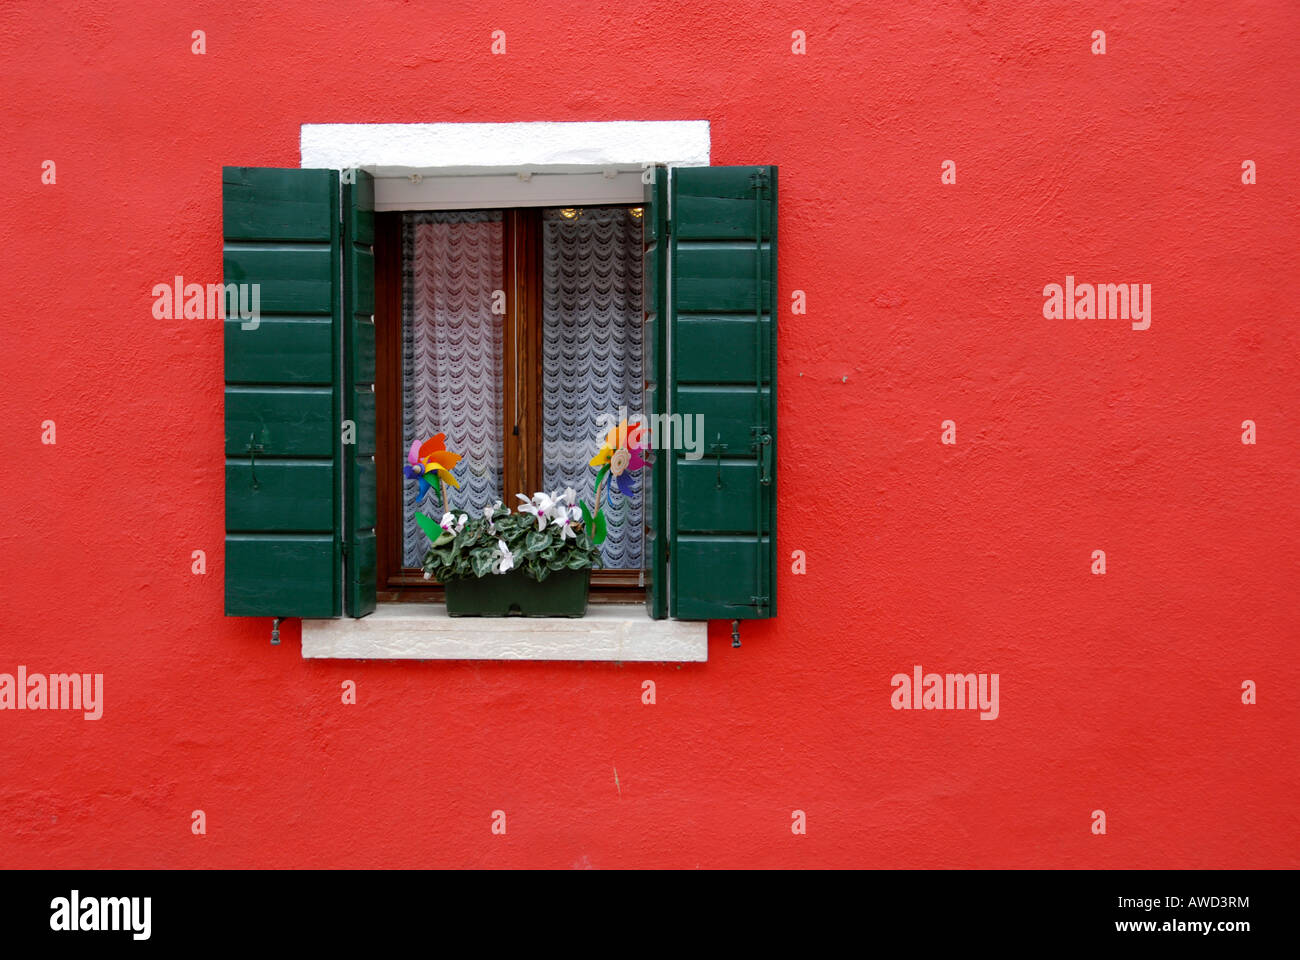 Window, Burano Island, Venice, Italy, Europe Stock Photo